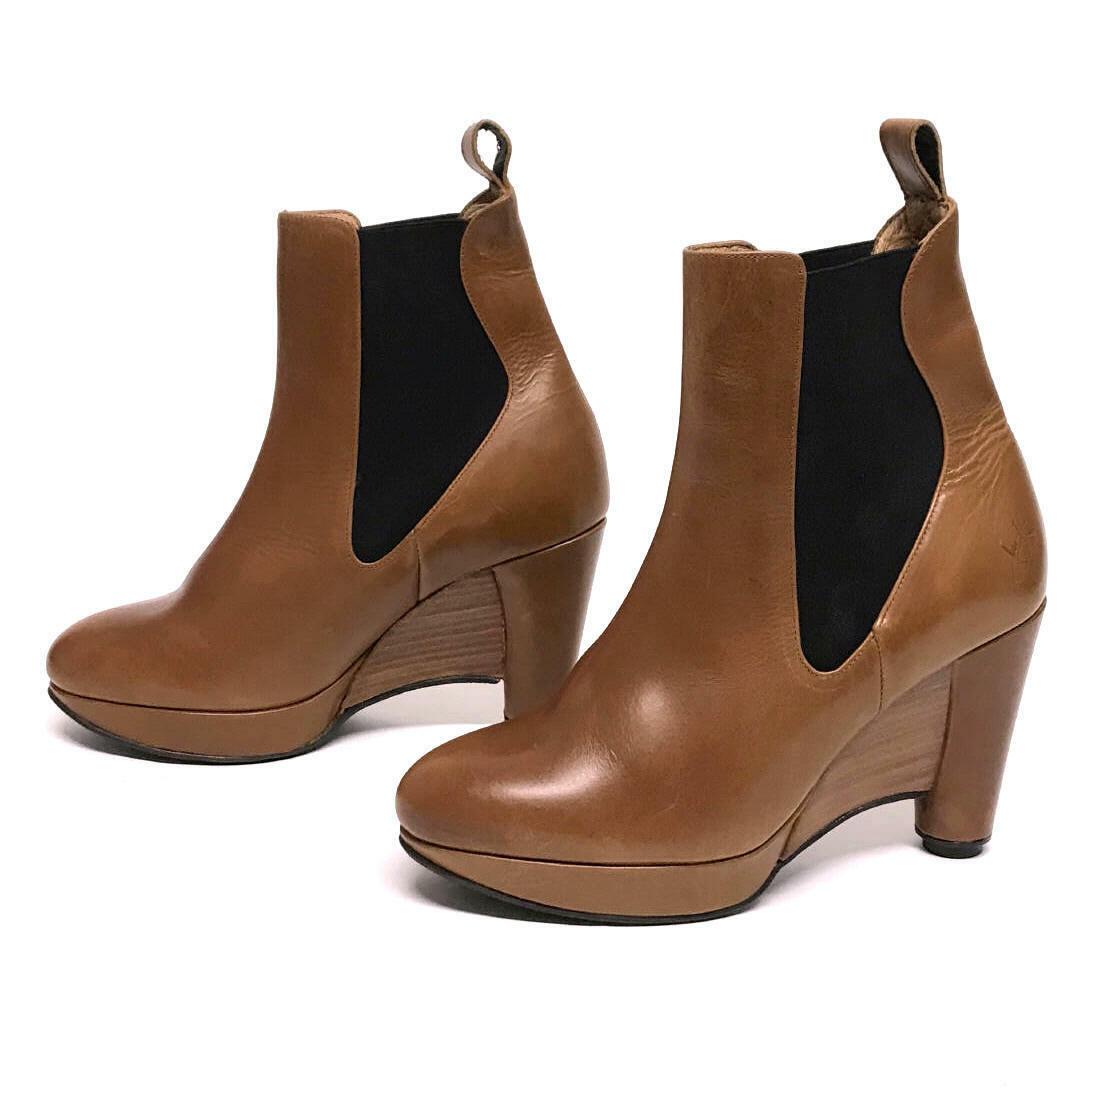 JOHN FLUEVOG PAGLIA Ankle Boots Booties Platform Wedge Heels 9 NEW RaRE SOLDOUT!